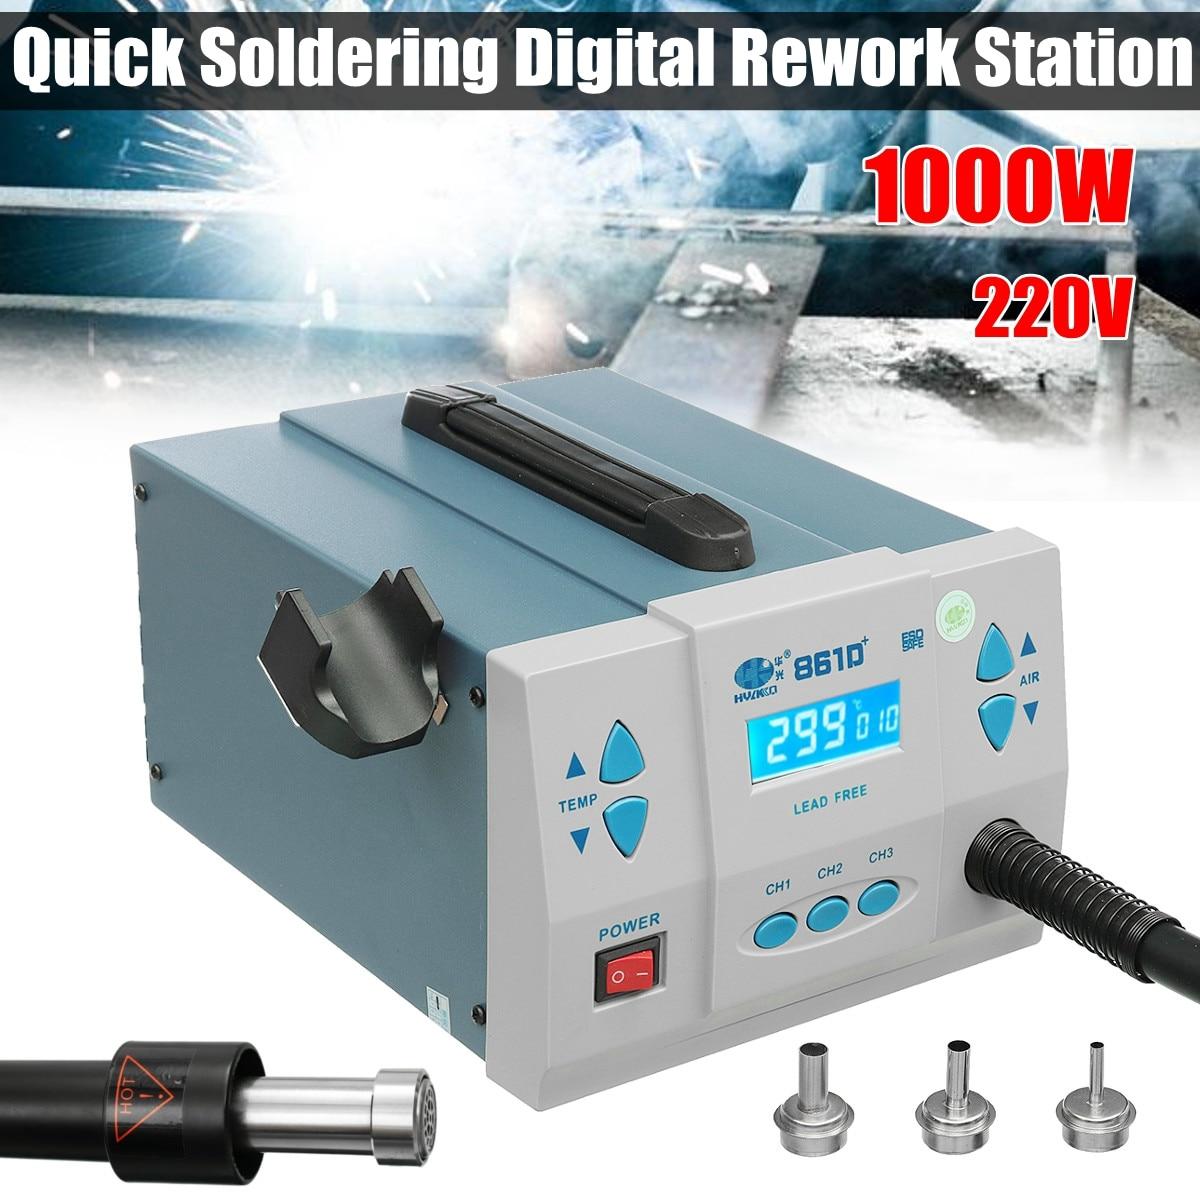 1000 w Termostatica Saldatura Rapida Digitale Stazione di Rilavorazione Senza Piombo Dissaldatura